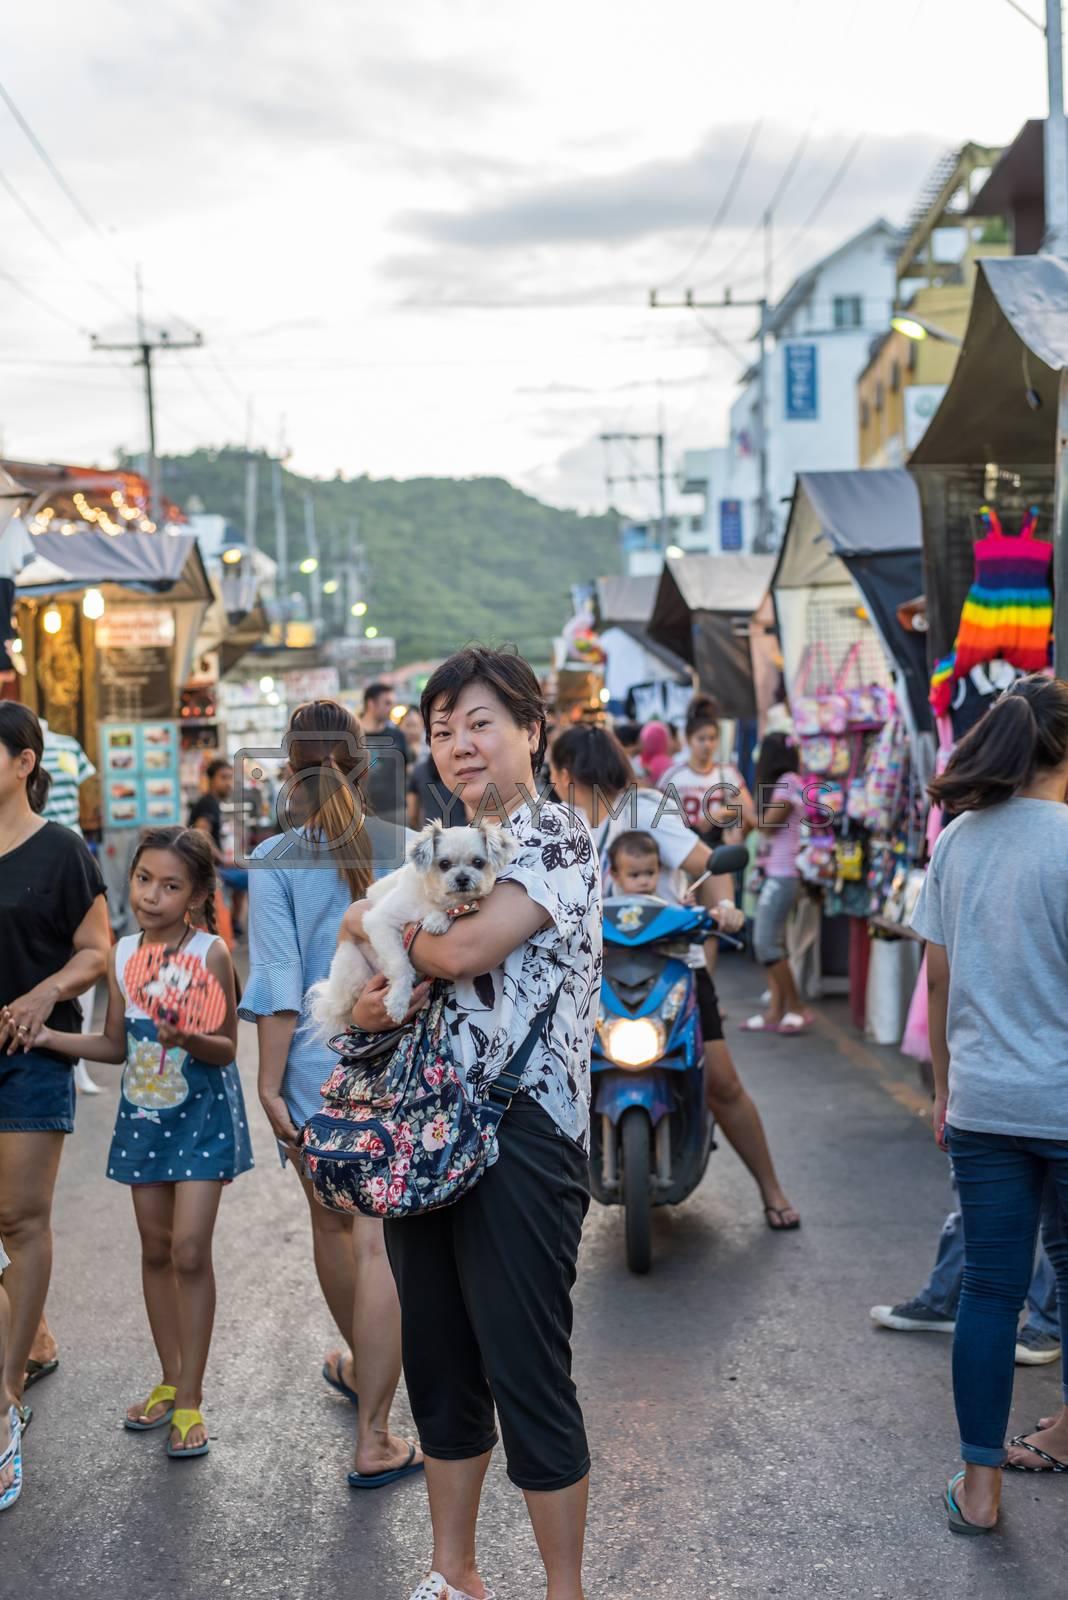 Hua Hin night market with woman and the dog by PongMoji